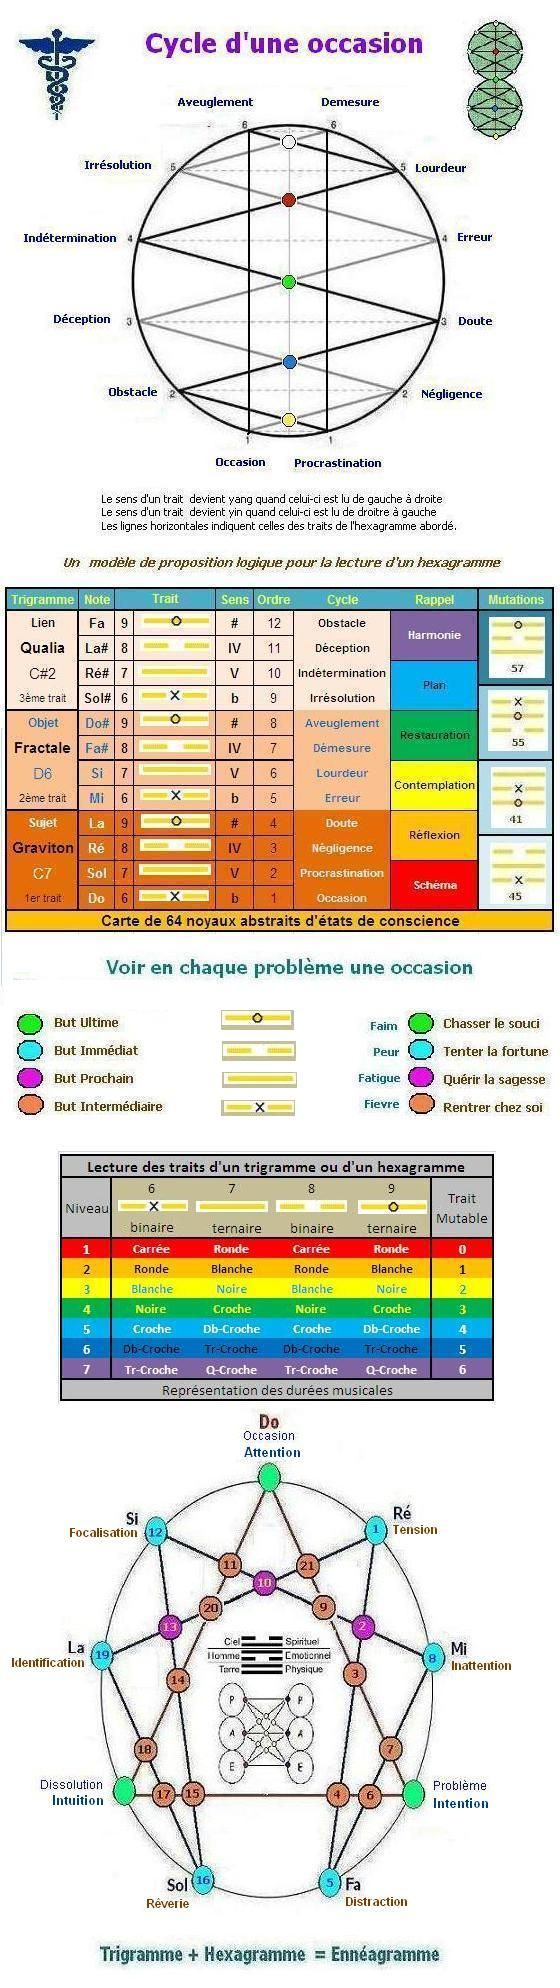 carte_etats_conscience_a36.jpg